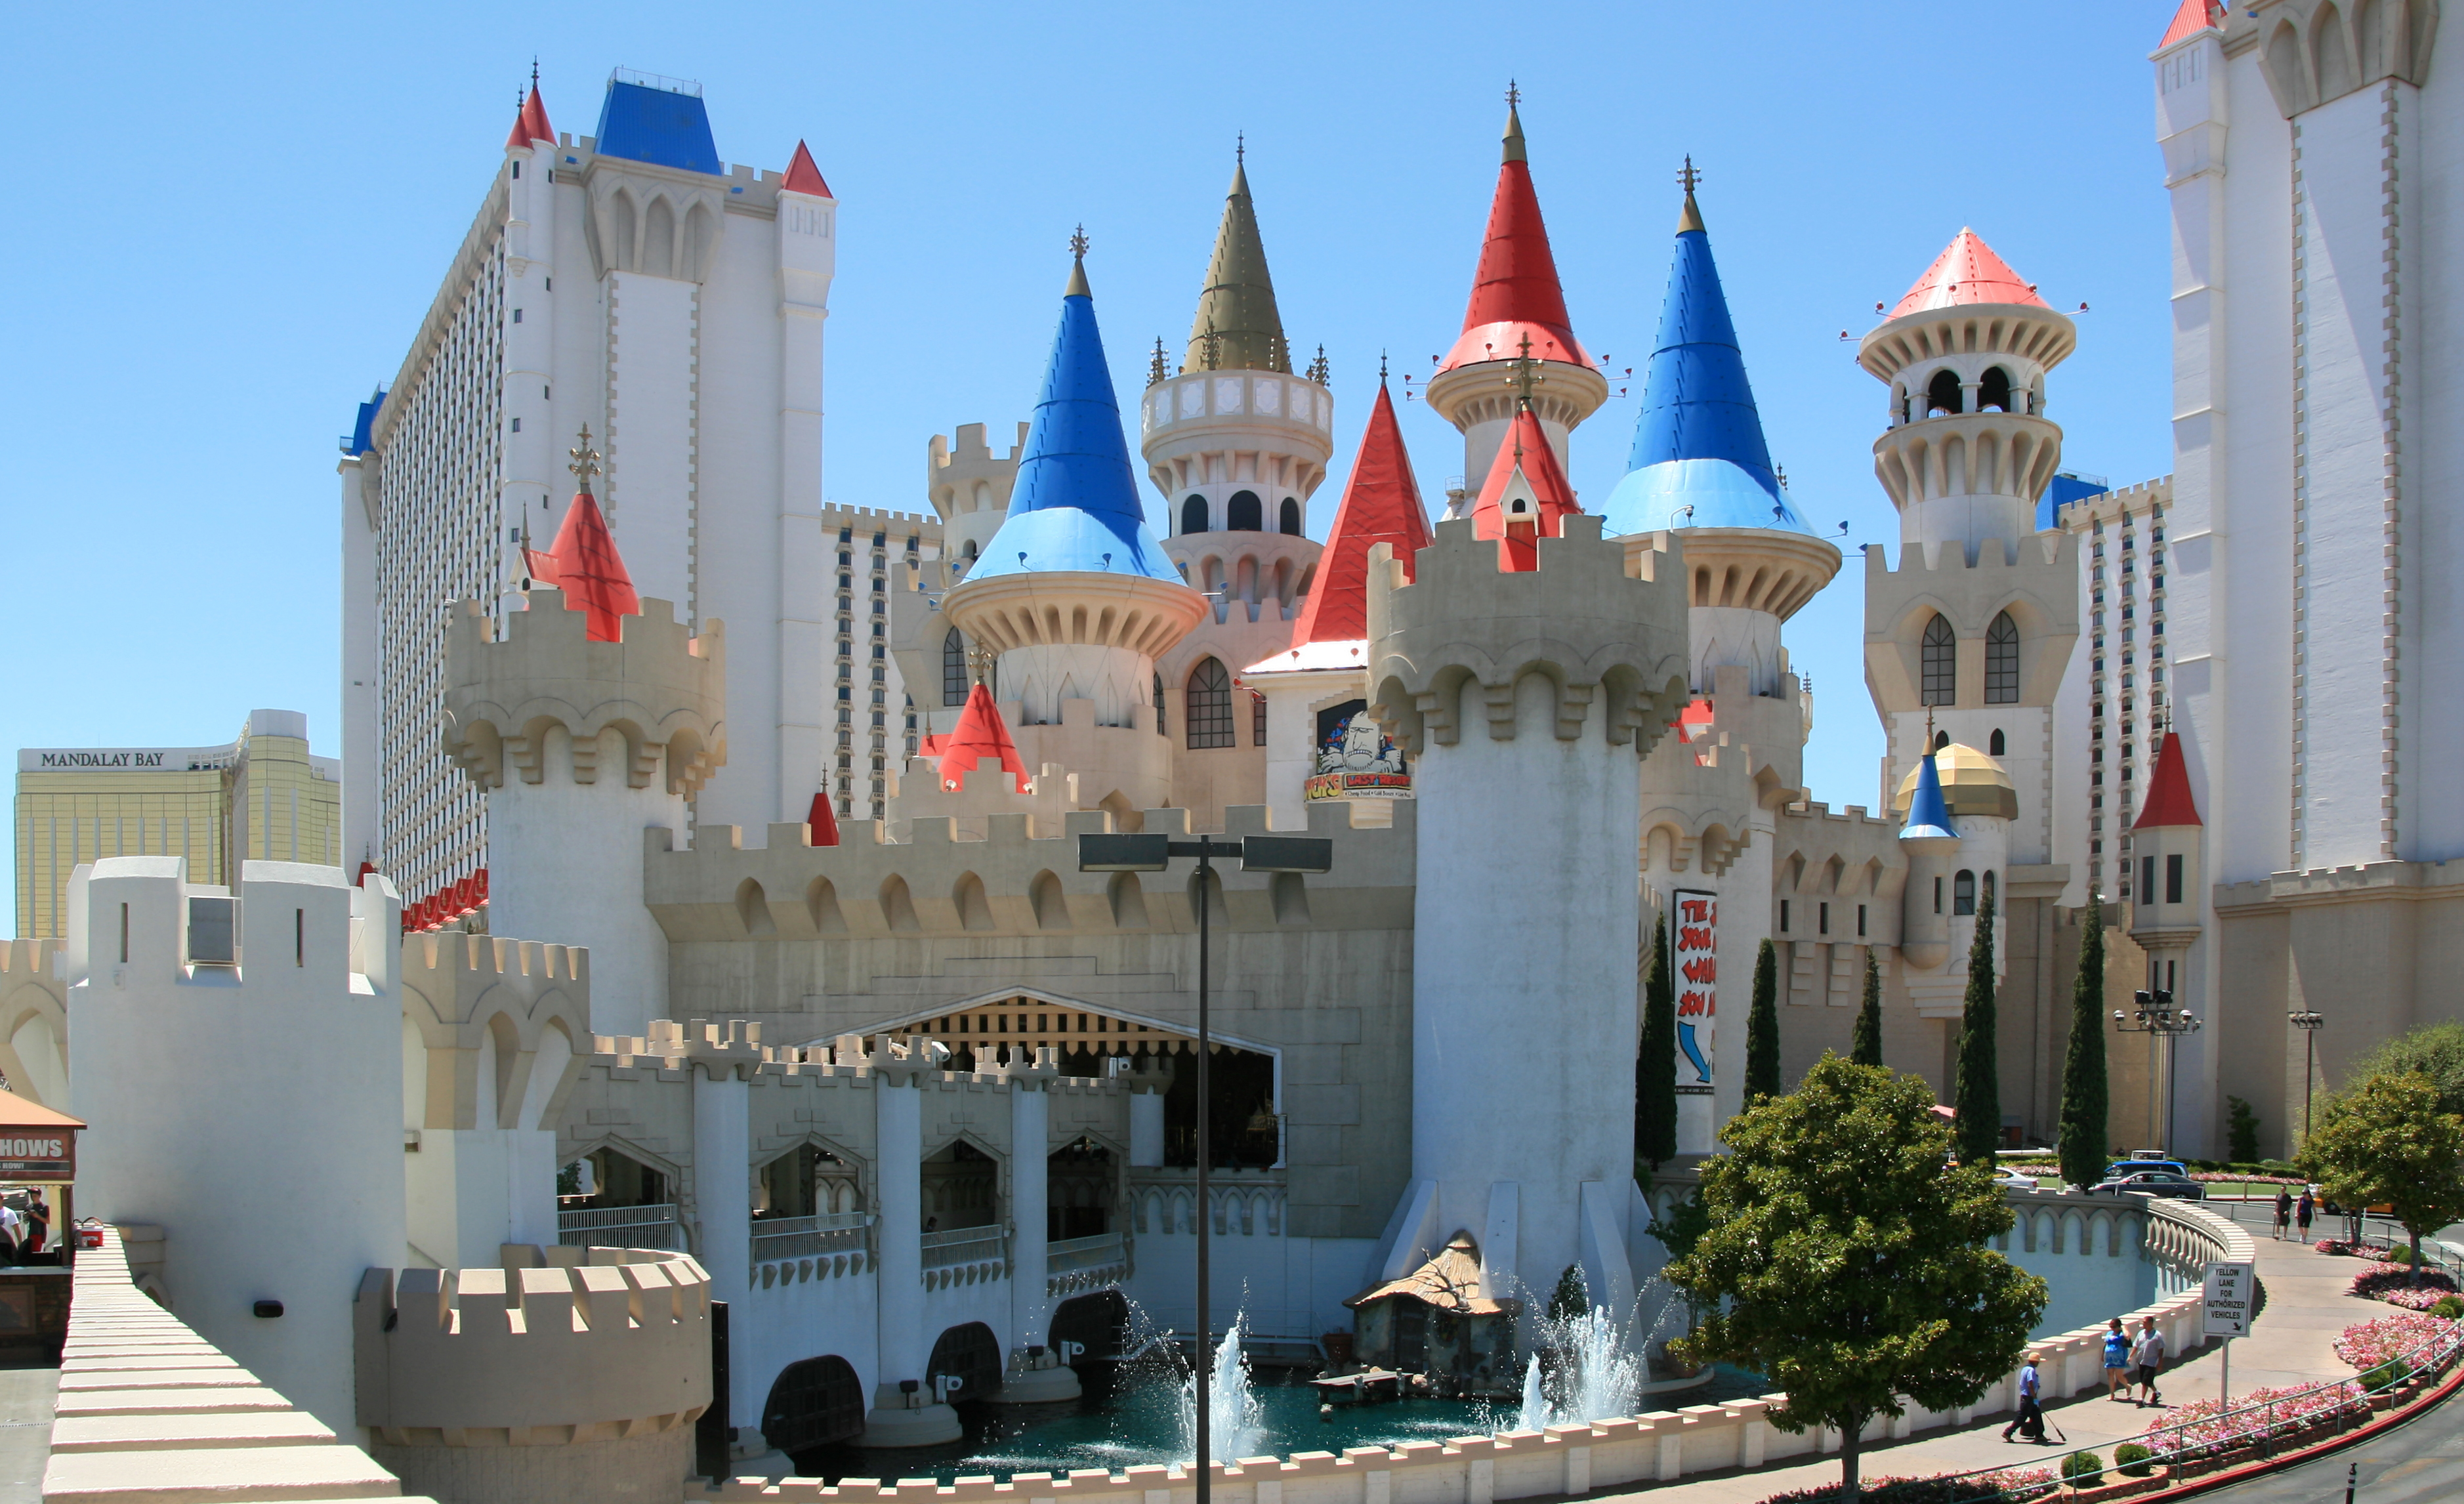 Excalibur casino wiki stakis casino leeds